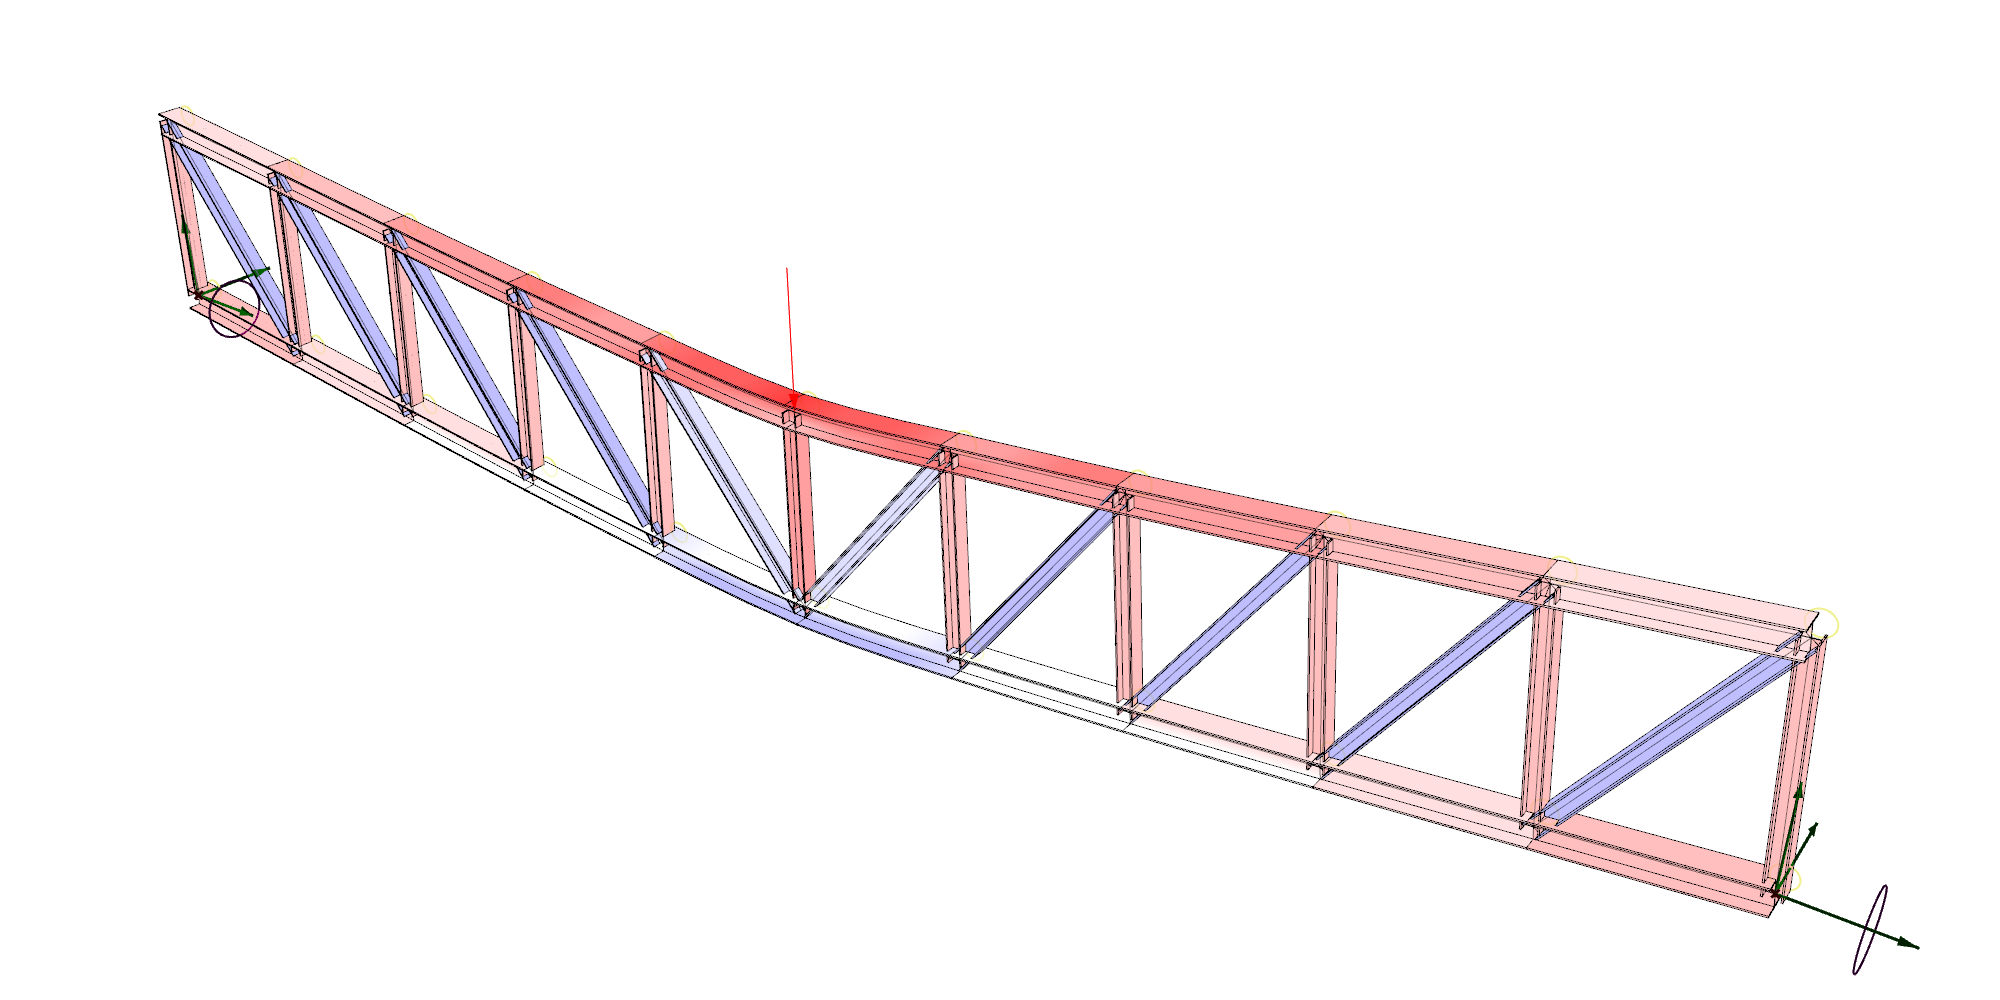 Parametric Truss